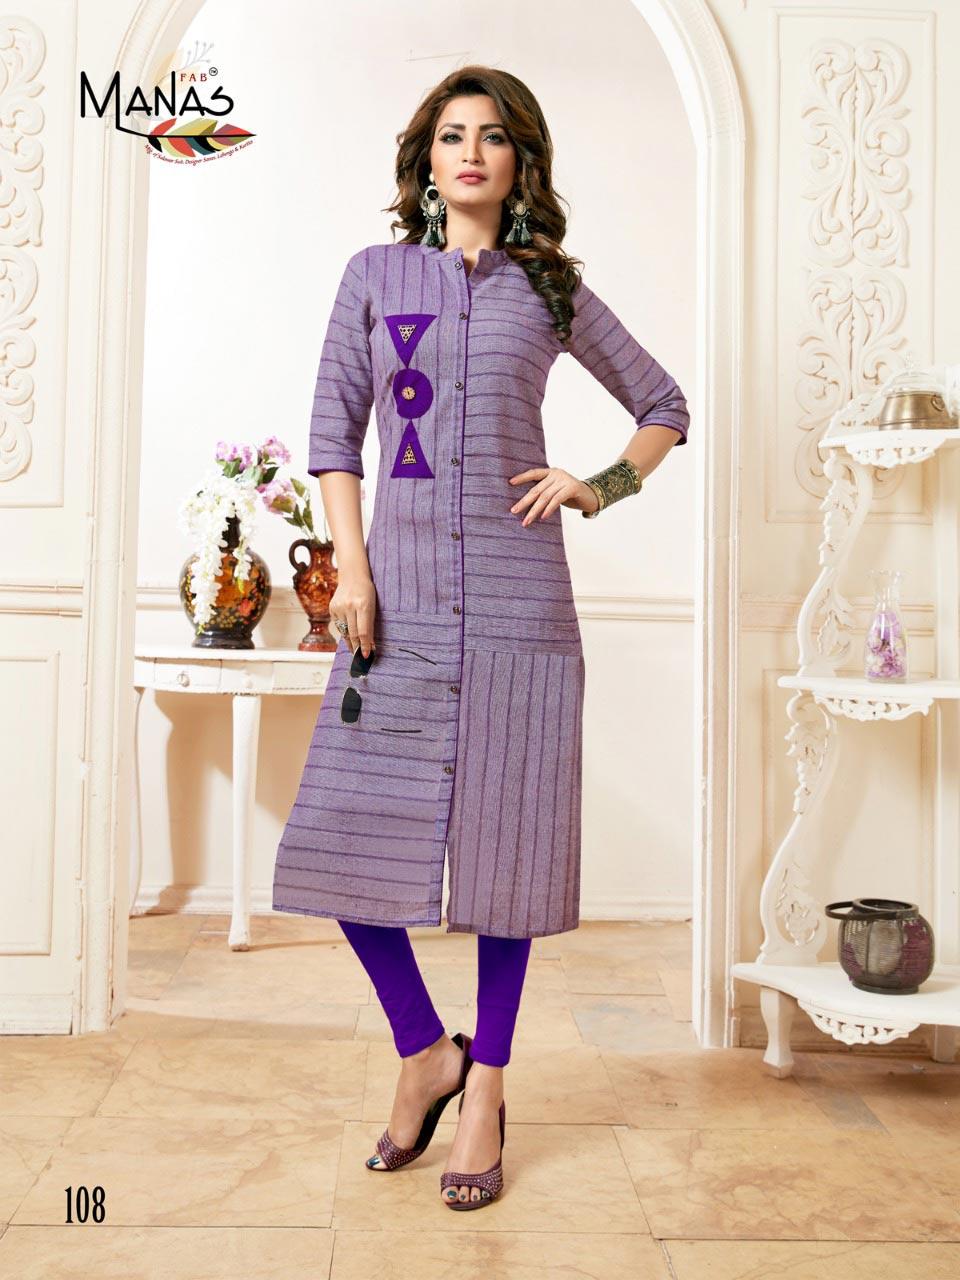 Meera Manas Handloom Cotton Kurti Manufacturer